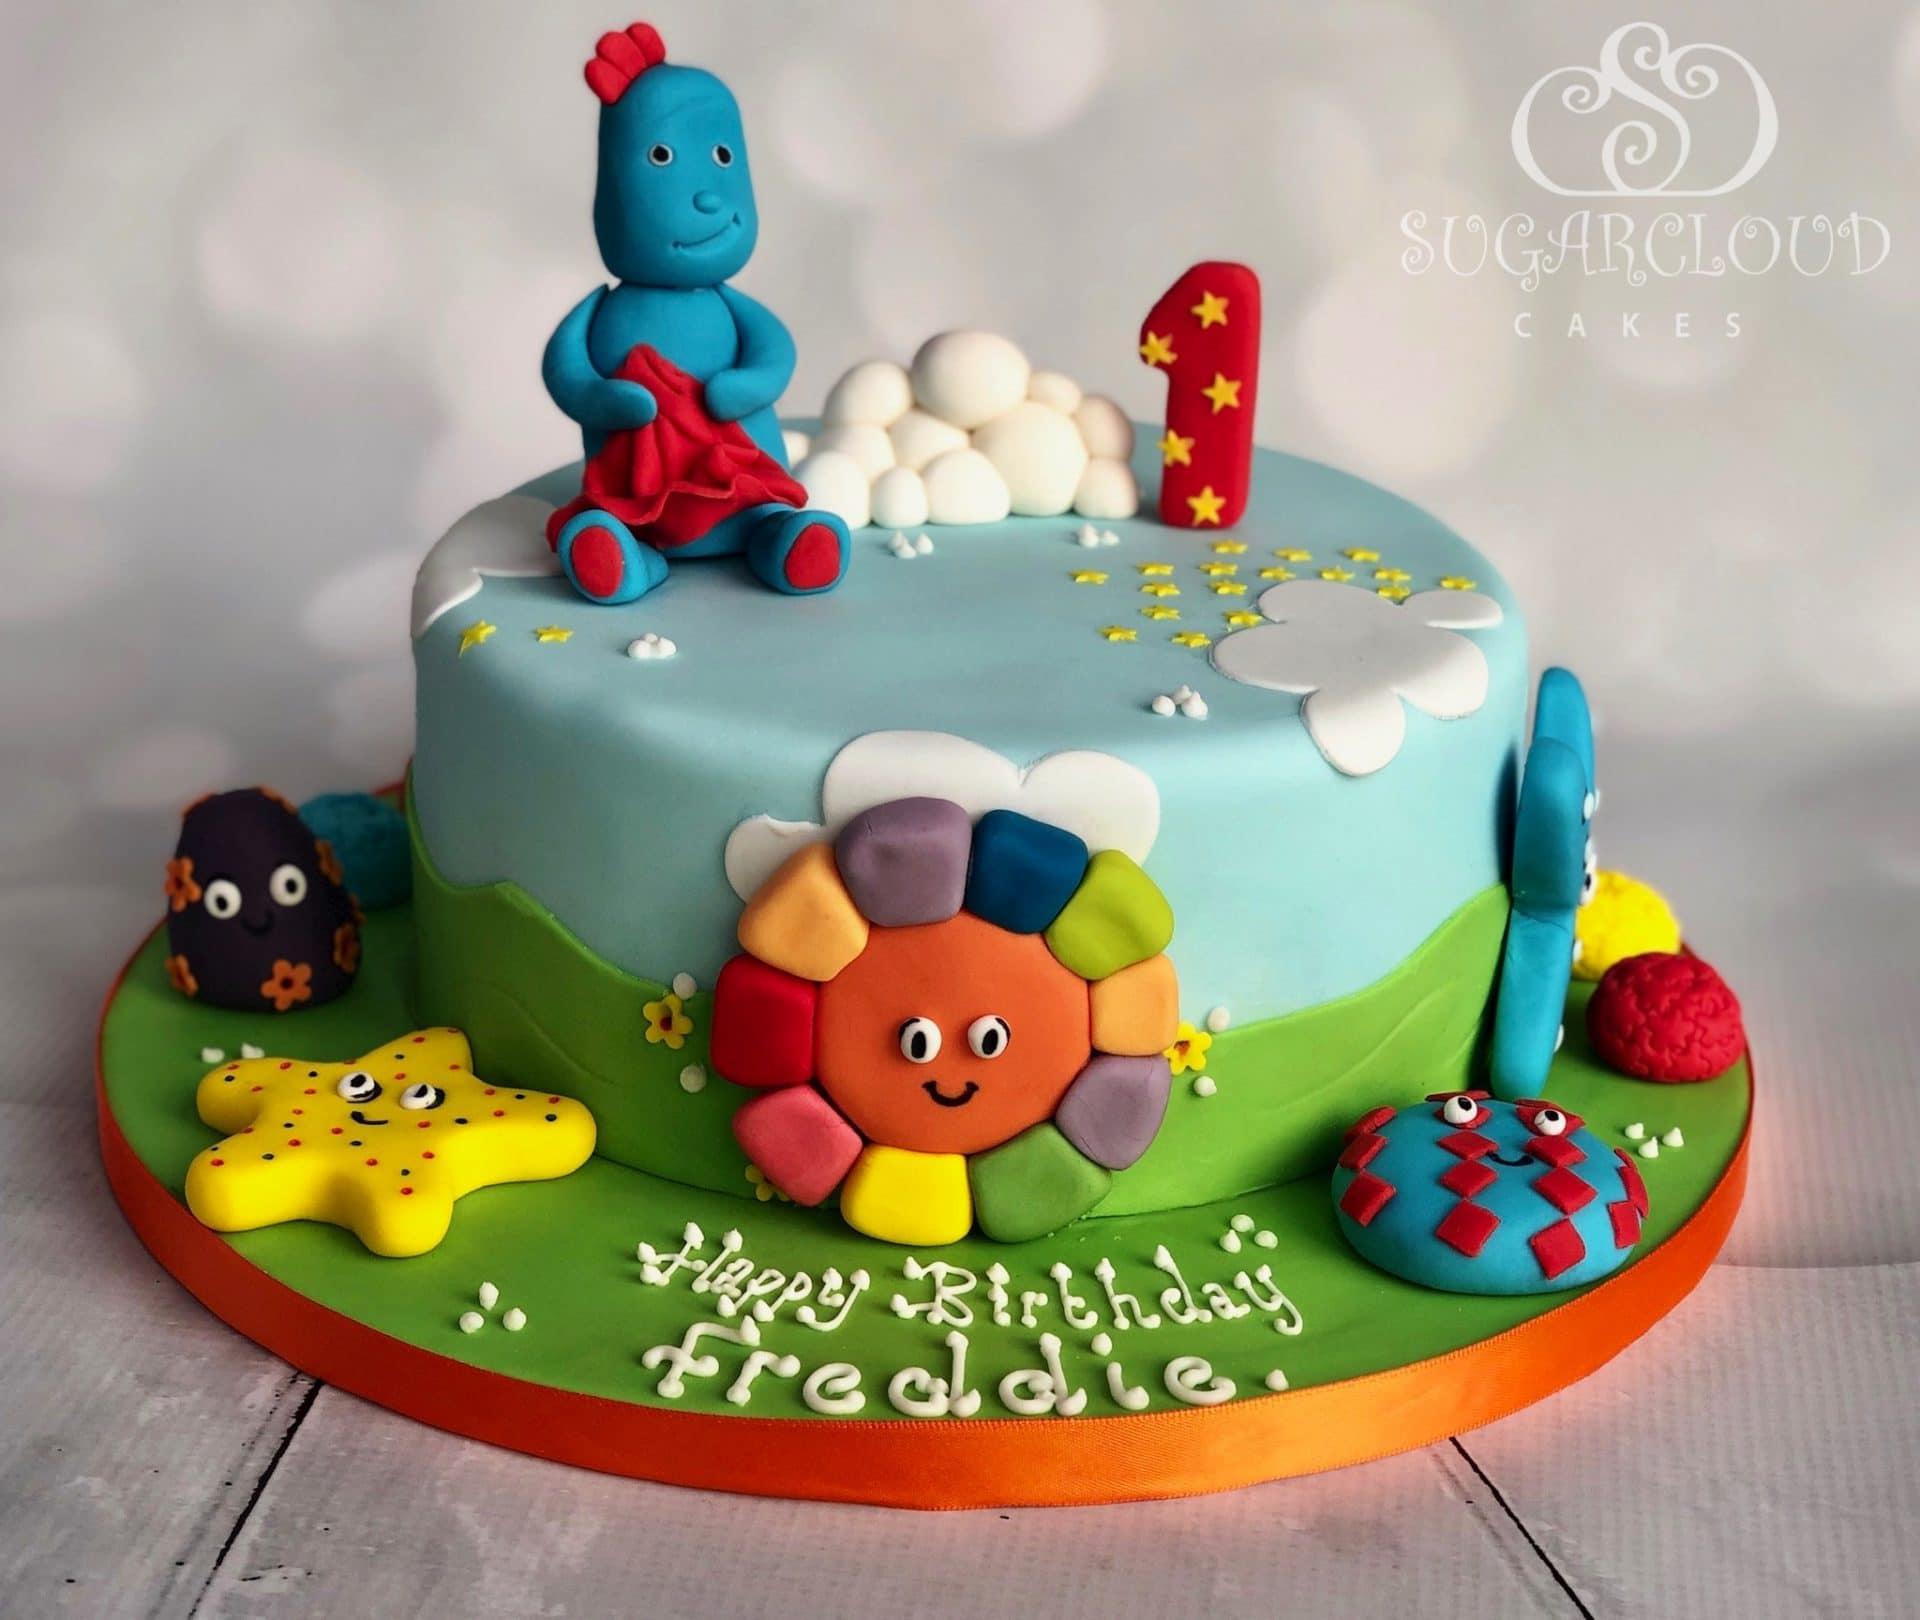 In the night garden inspired birthday cake